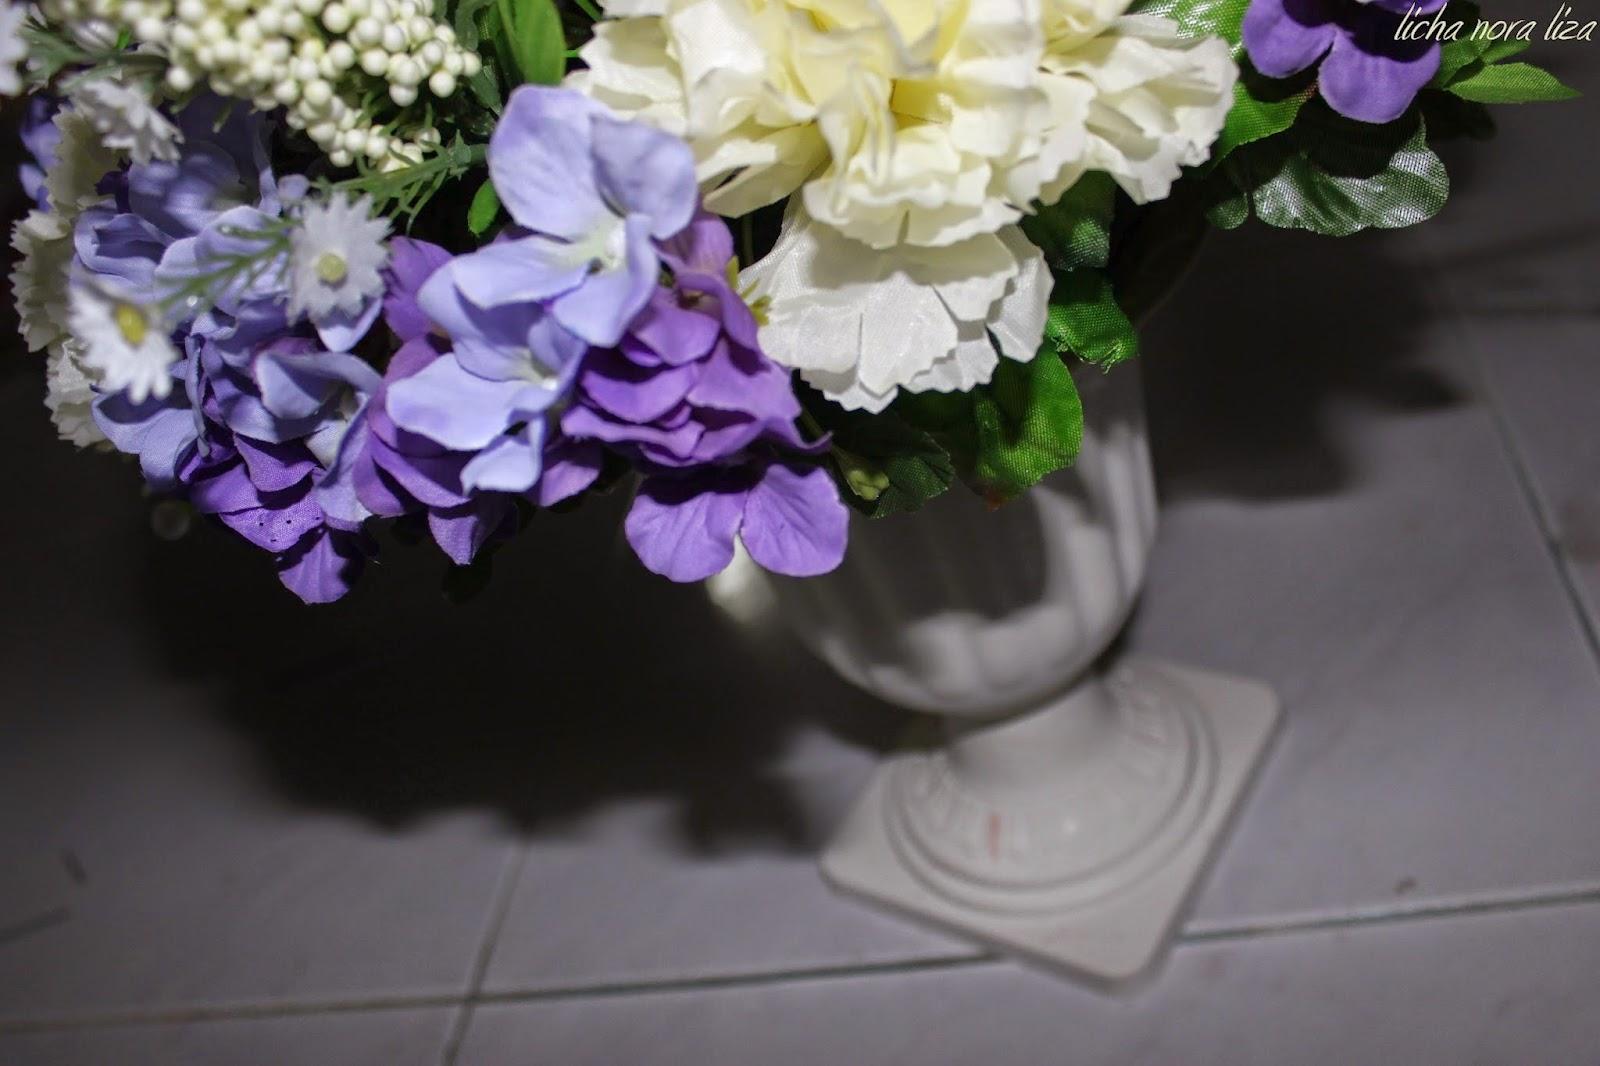 DIY Bunga Hiasan Pelamin Tema Ungu Putih Nora Liza